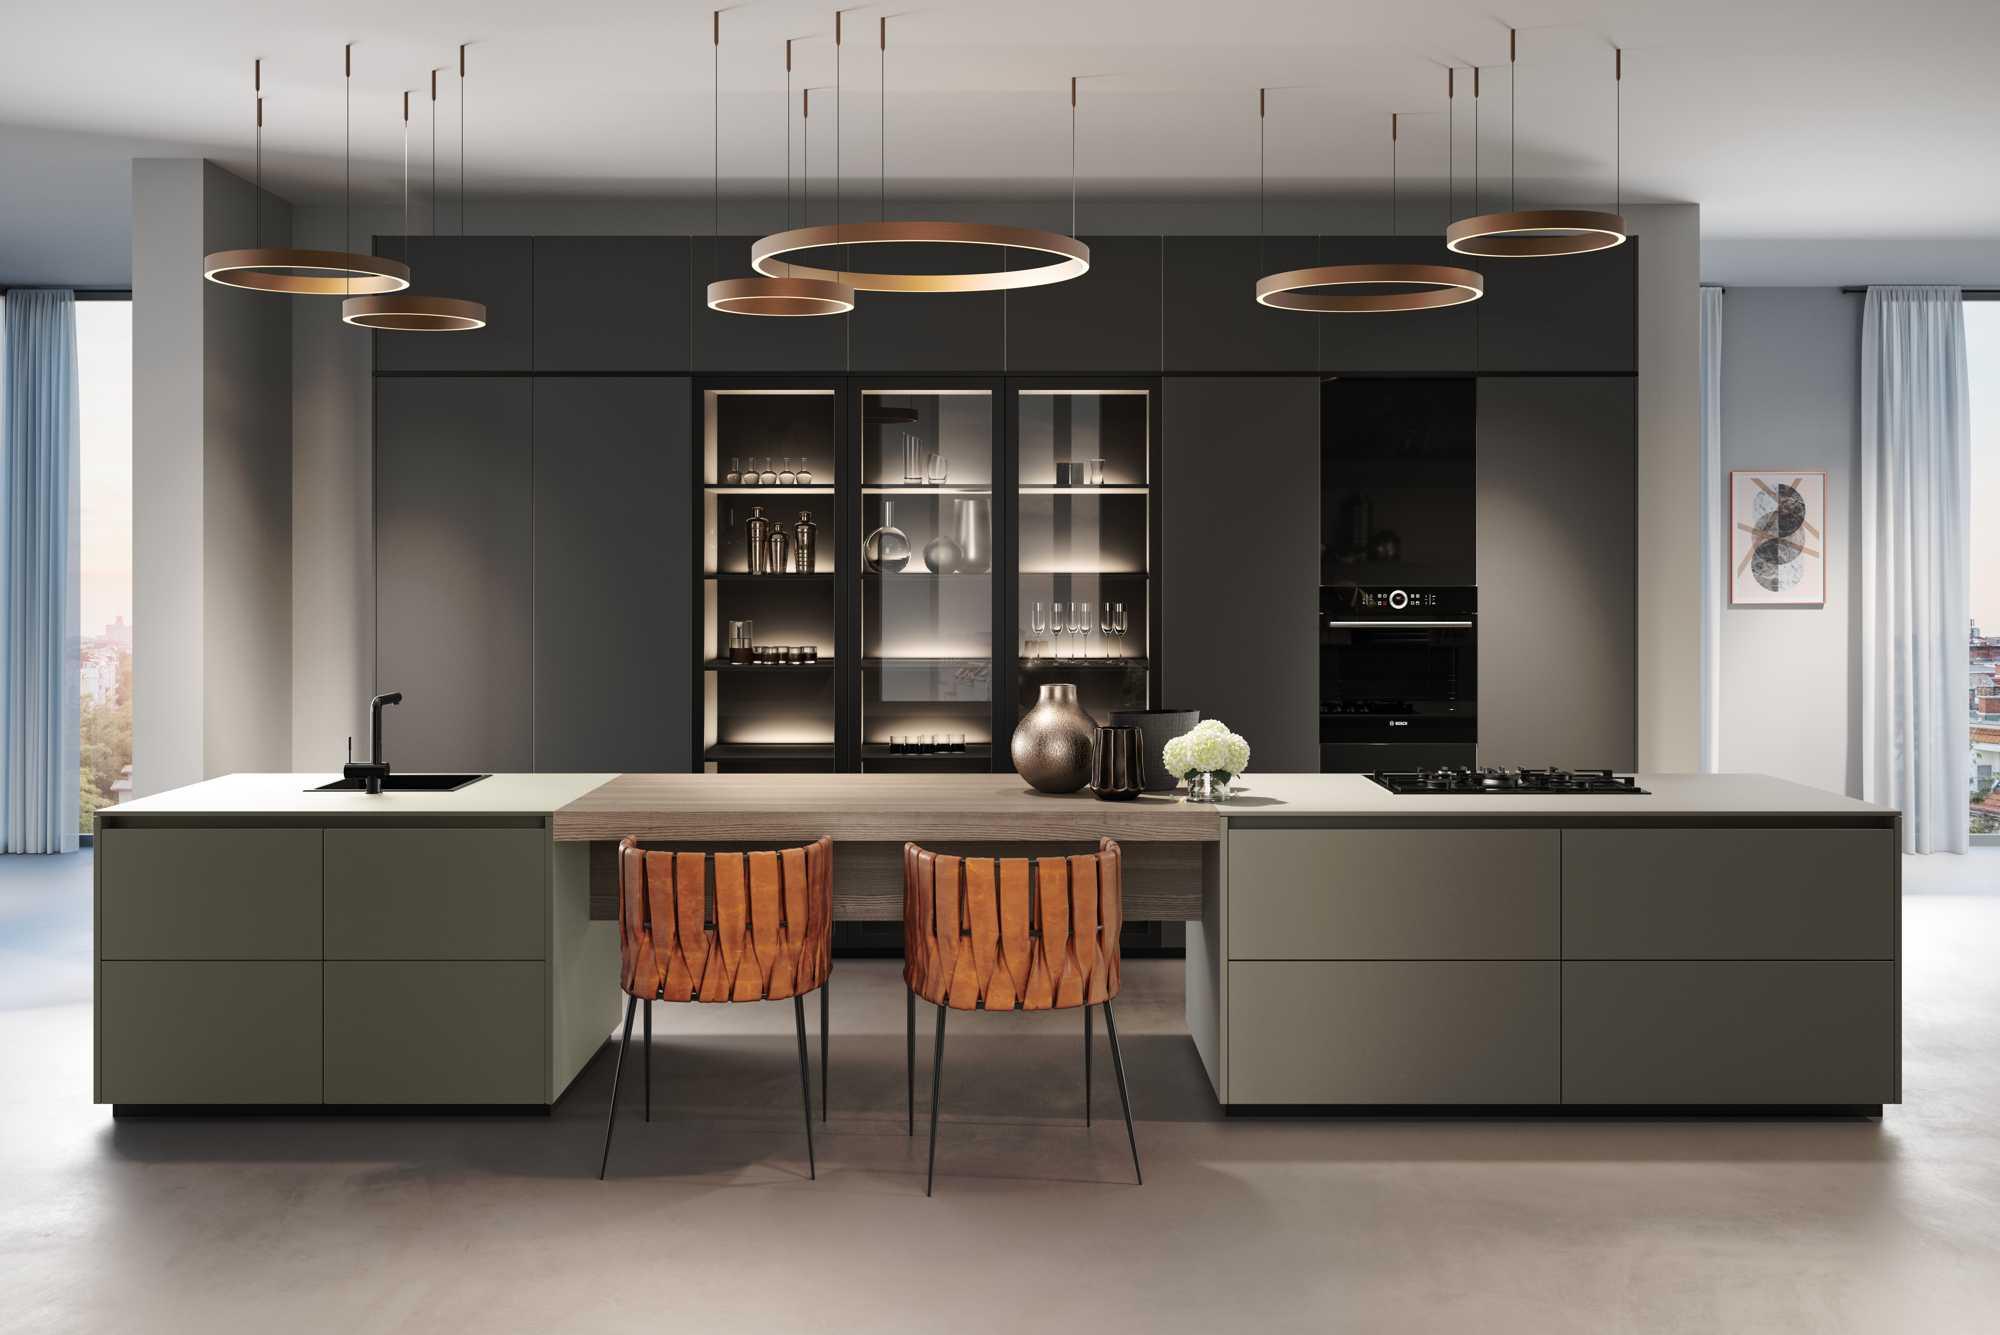 ZeroxUmbra XT, XeroxLava XT and Class VI Black HL Kitchen